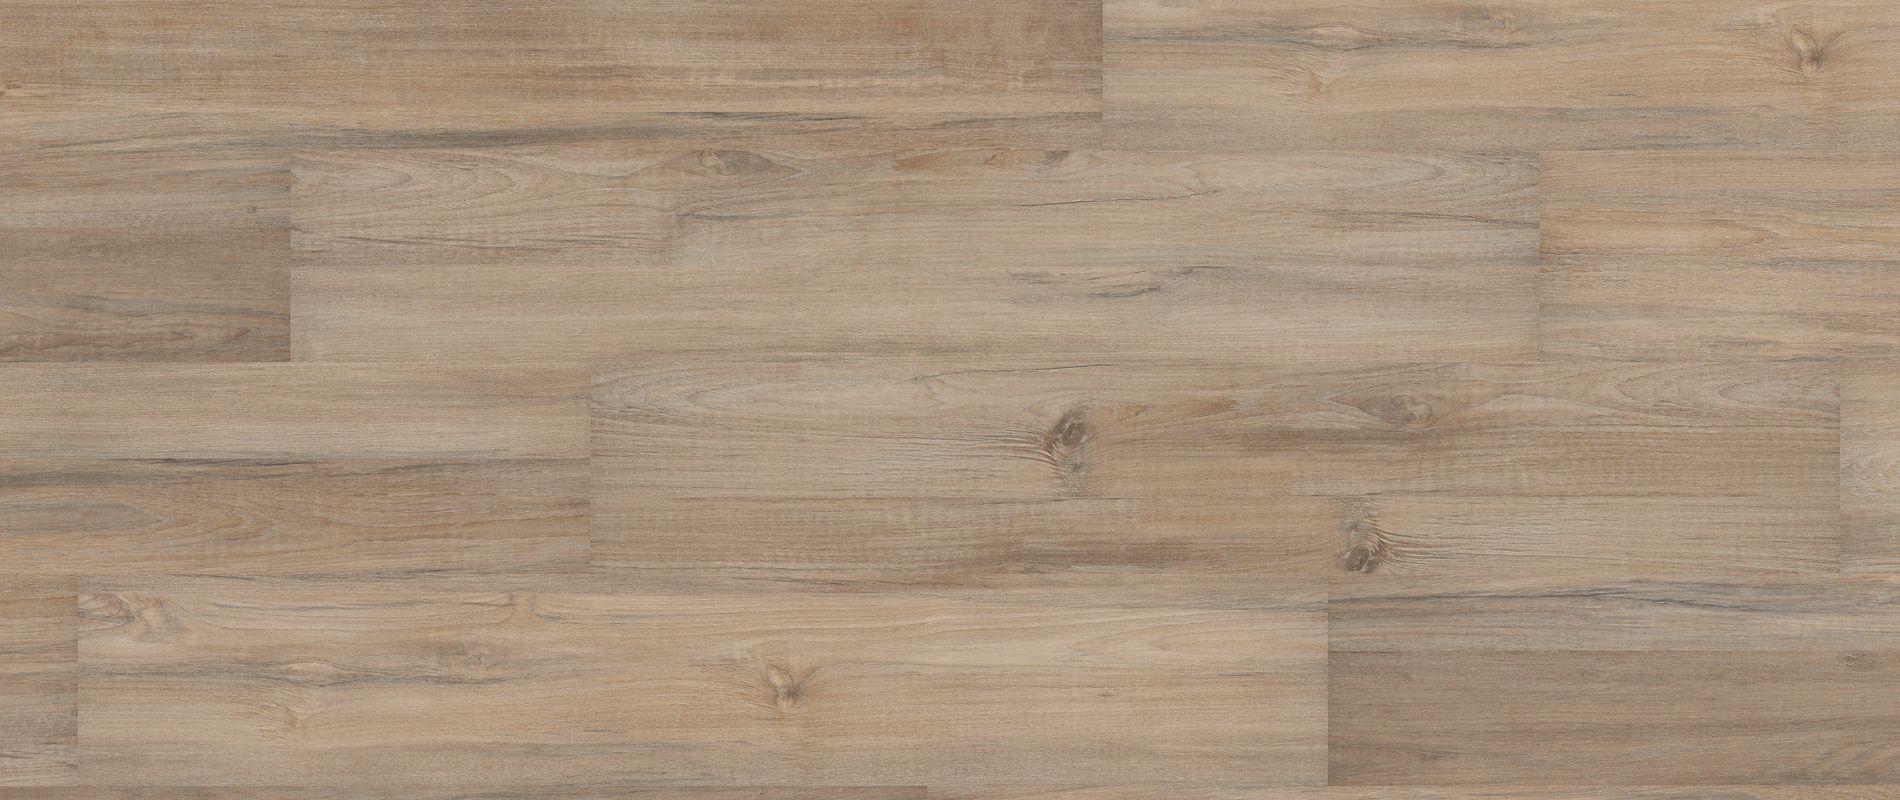 vinylboden angebot beautiful poco with vinylboden angebot cool angebot vinylboden with. Black Bedroom Furniture Sets. Home Design Ideas